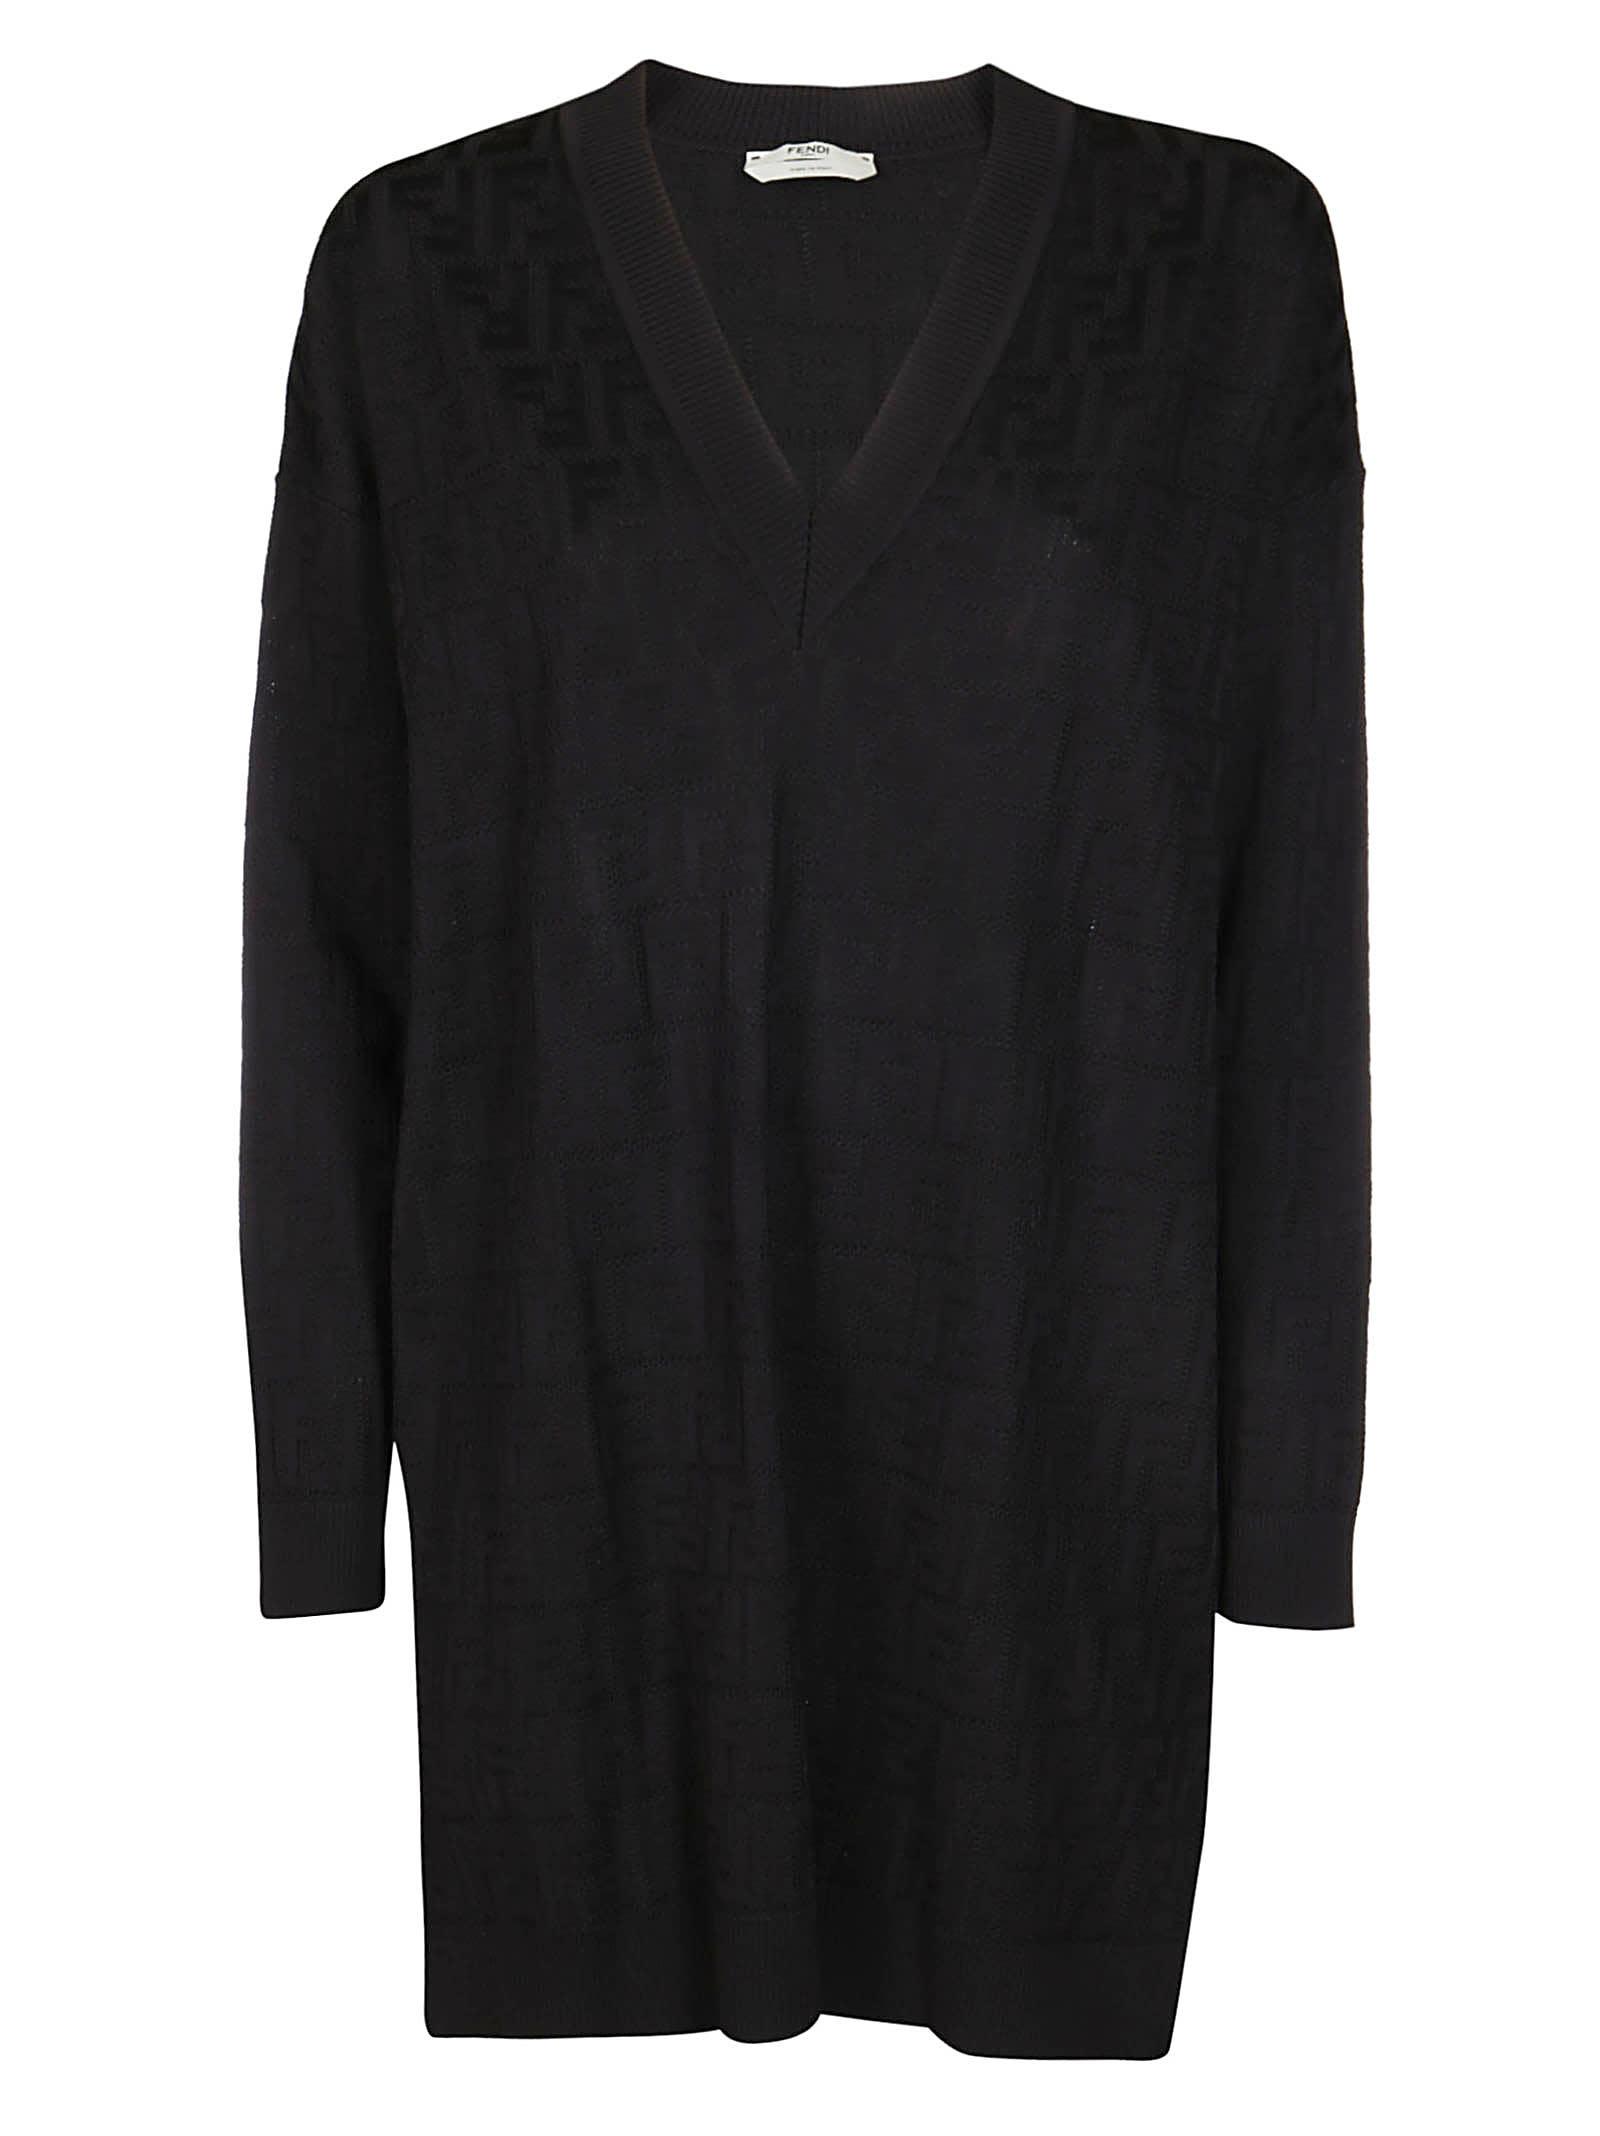 Buy Fendi Black Cotton-viscose Blend Dress online, shop Fendi with free shipping